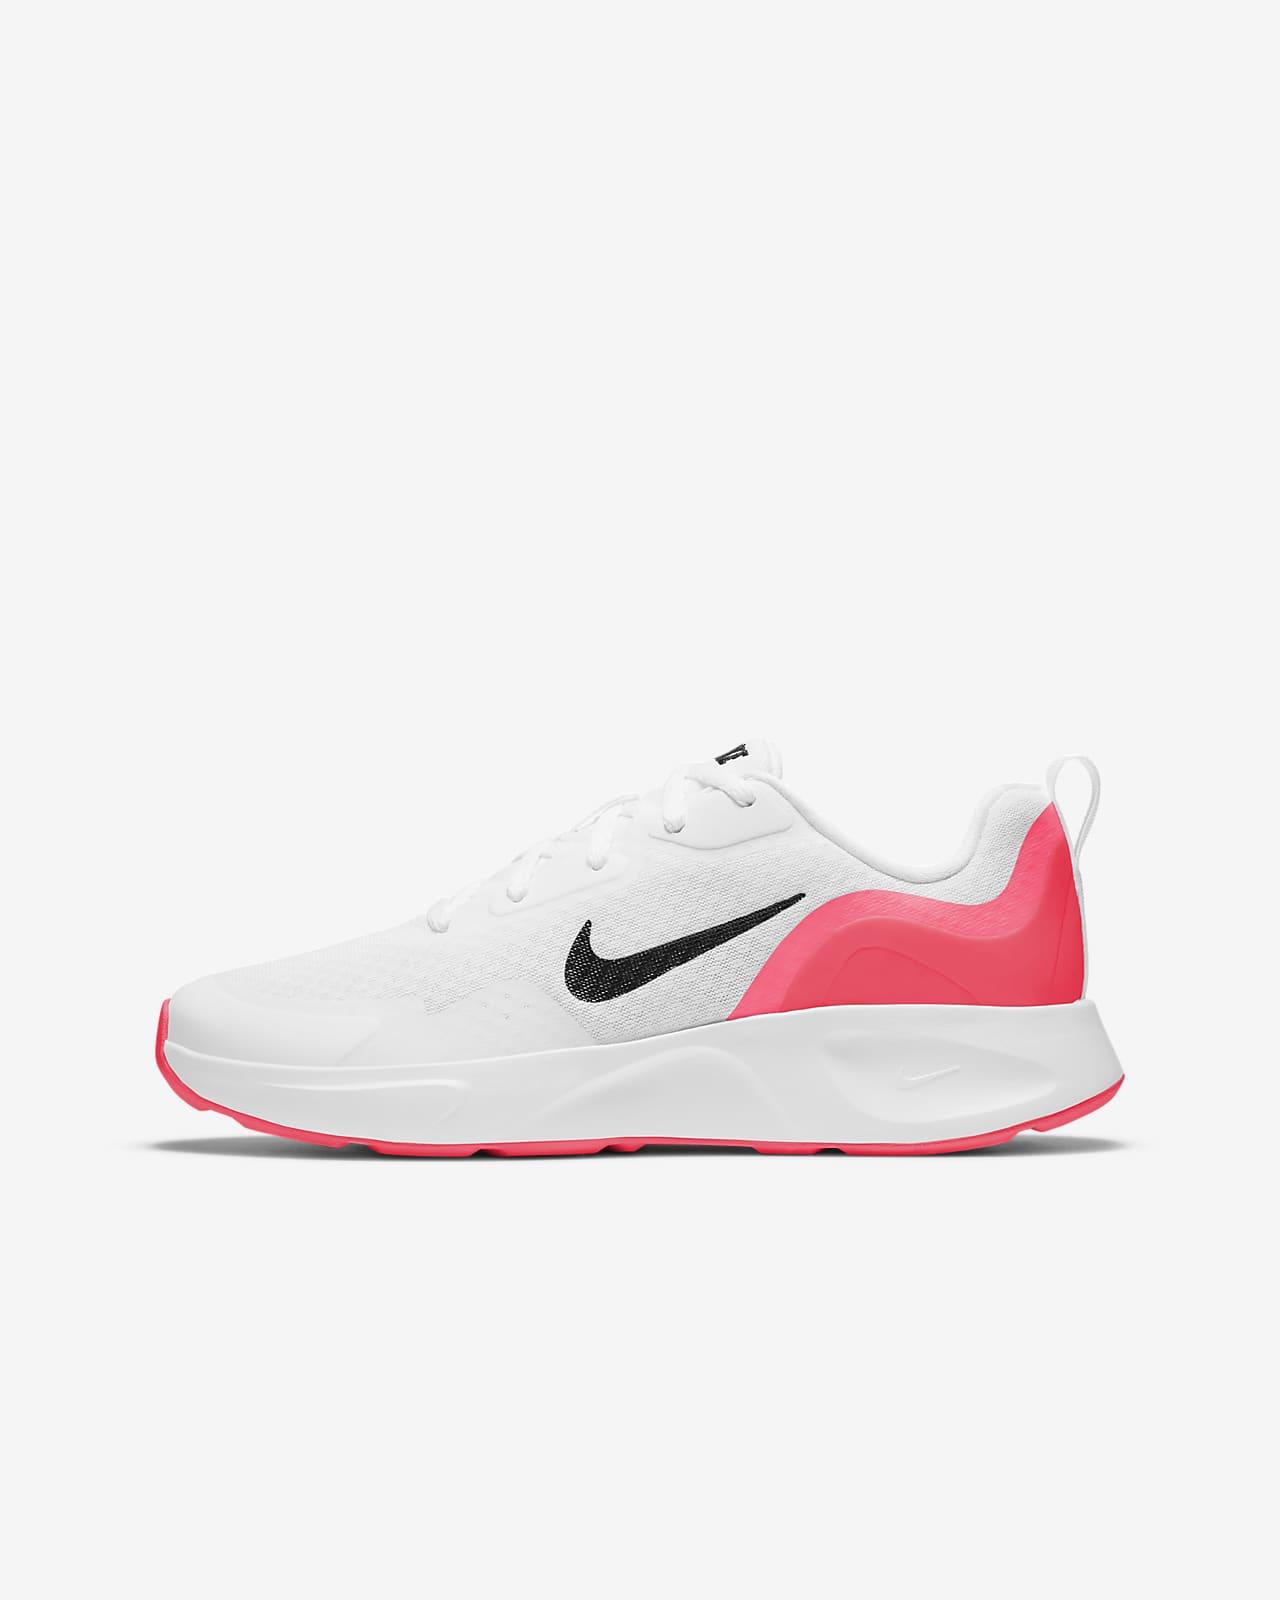 Nike Shoes Boys Uk Flash Sale Up To